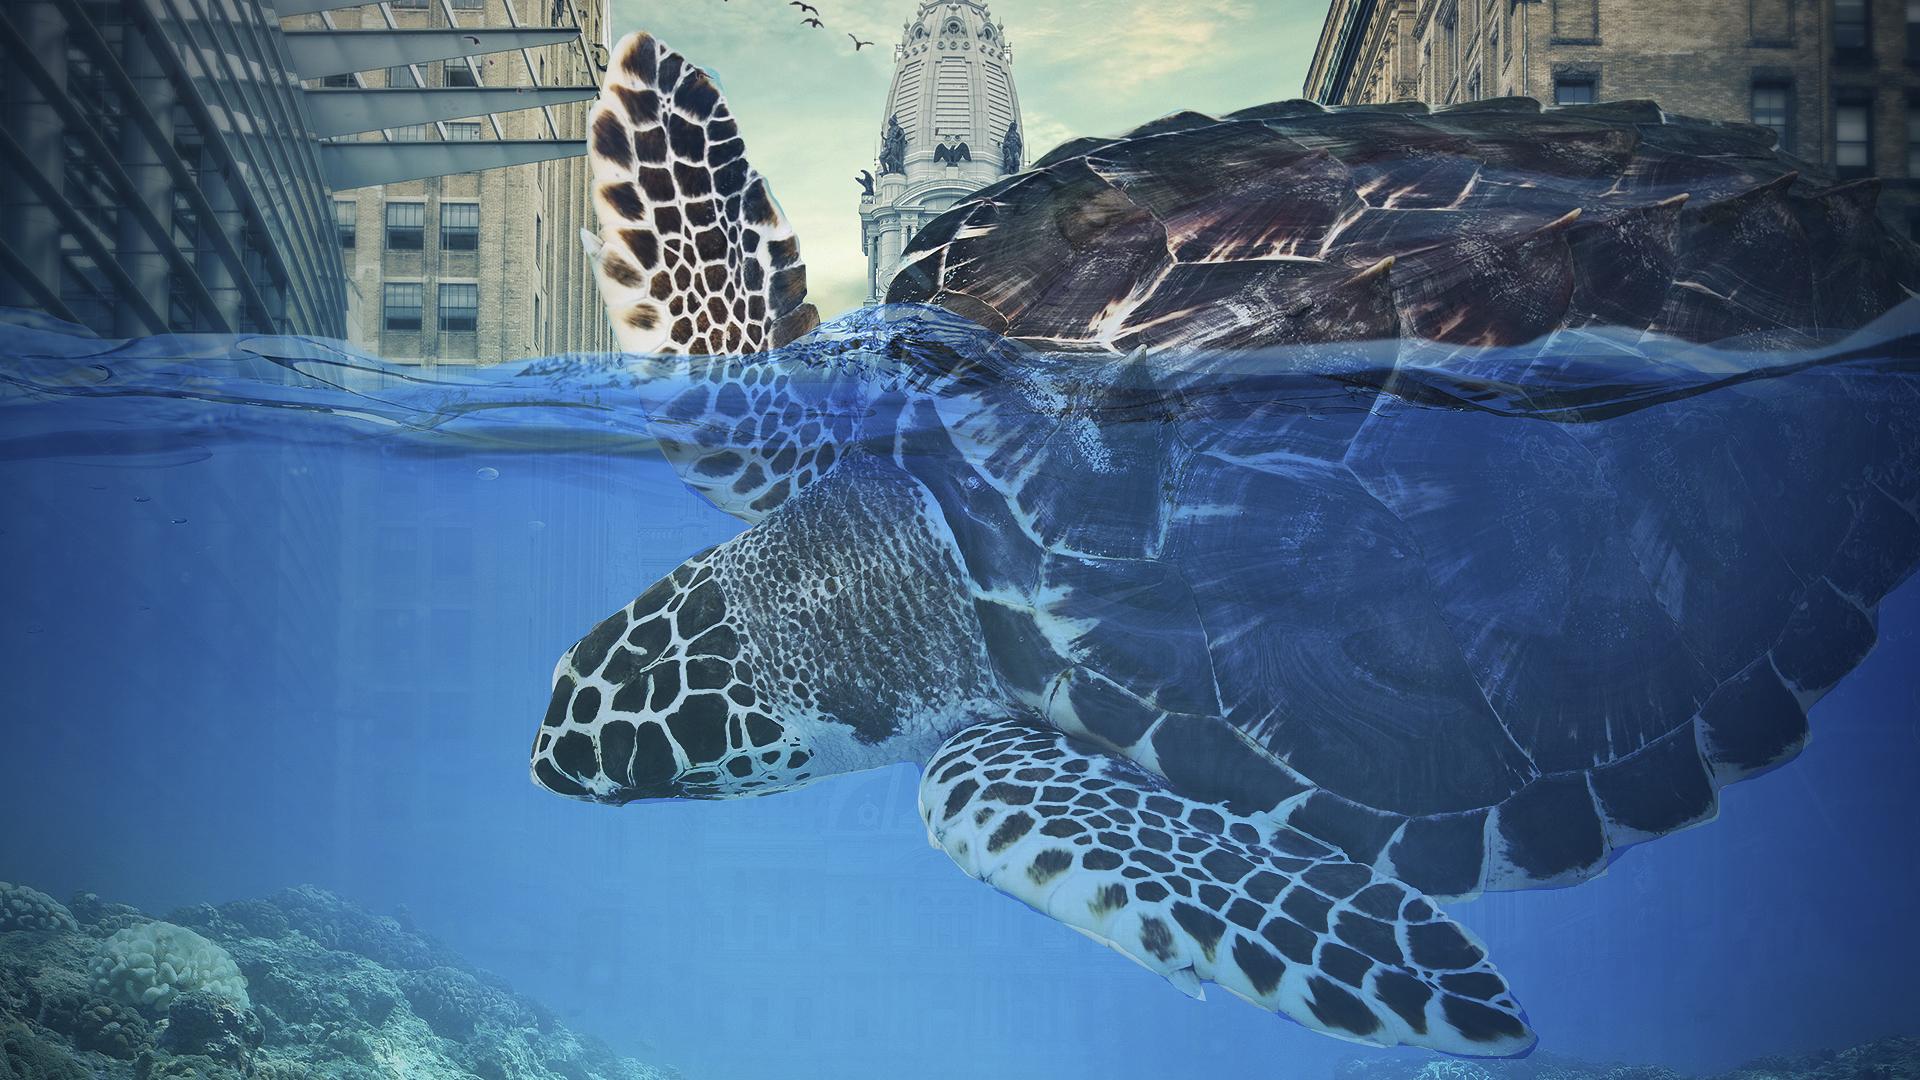 Gaint Turtle Wallpapers Hd Wallpapers